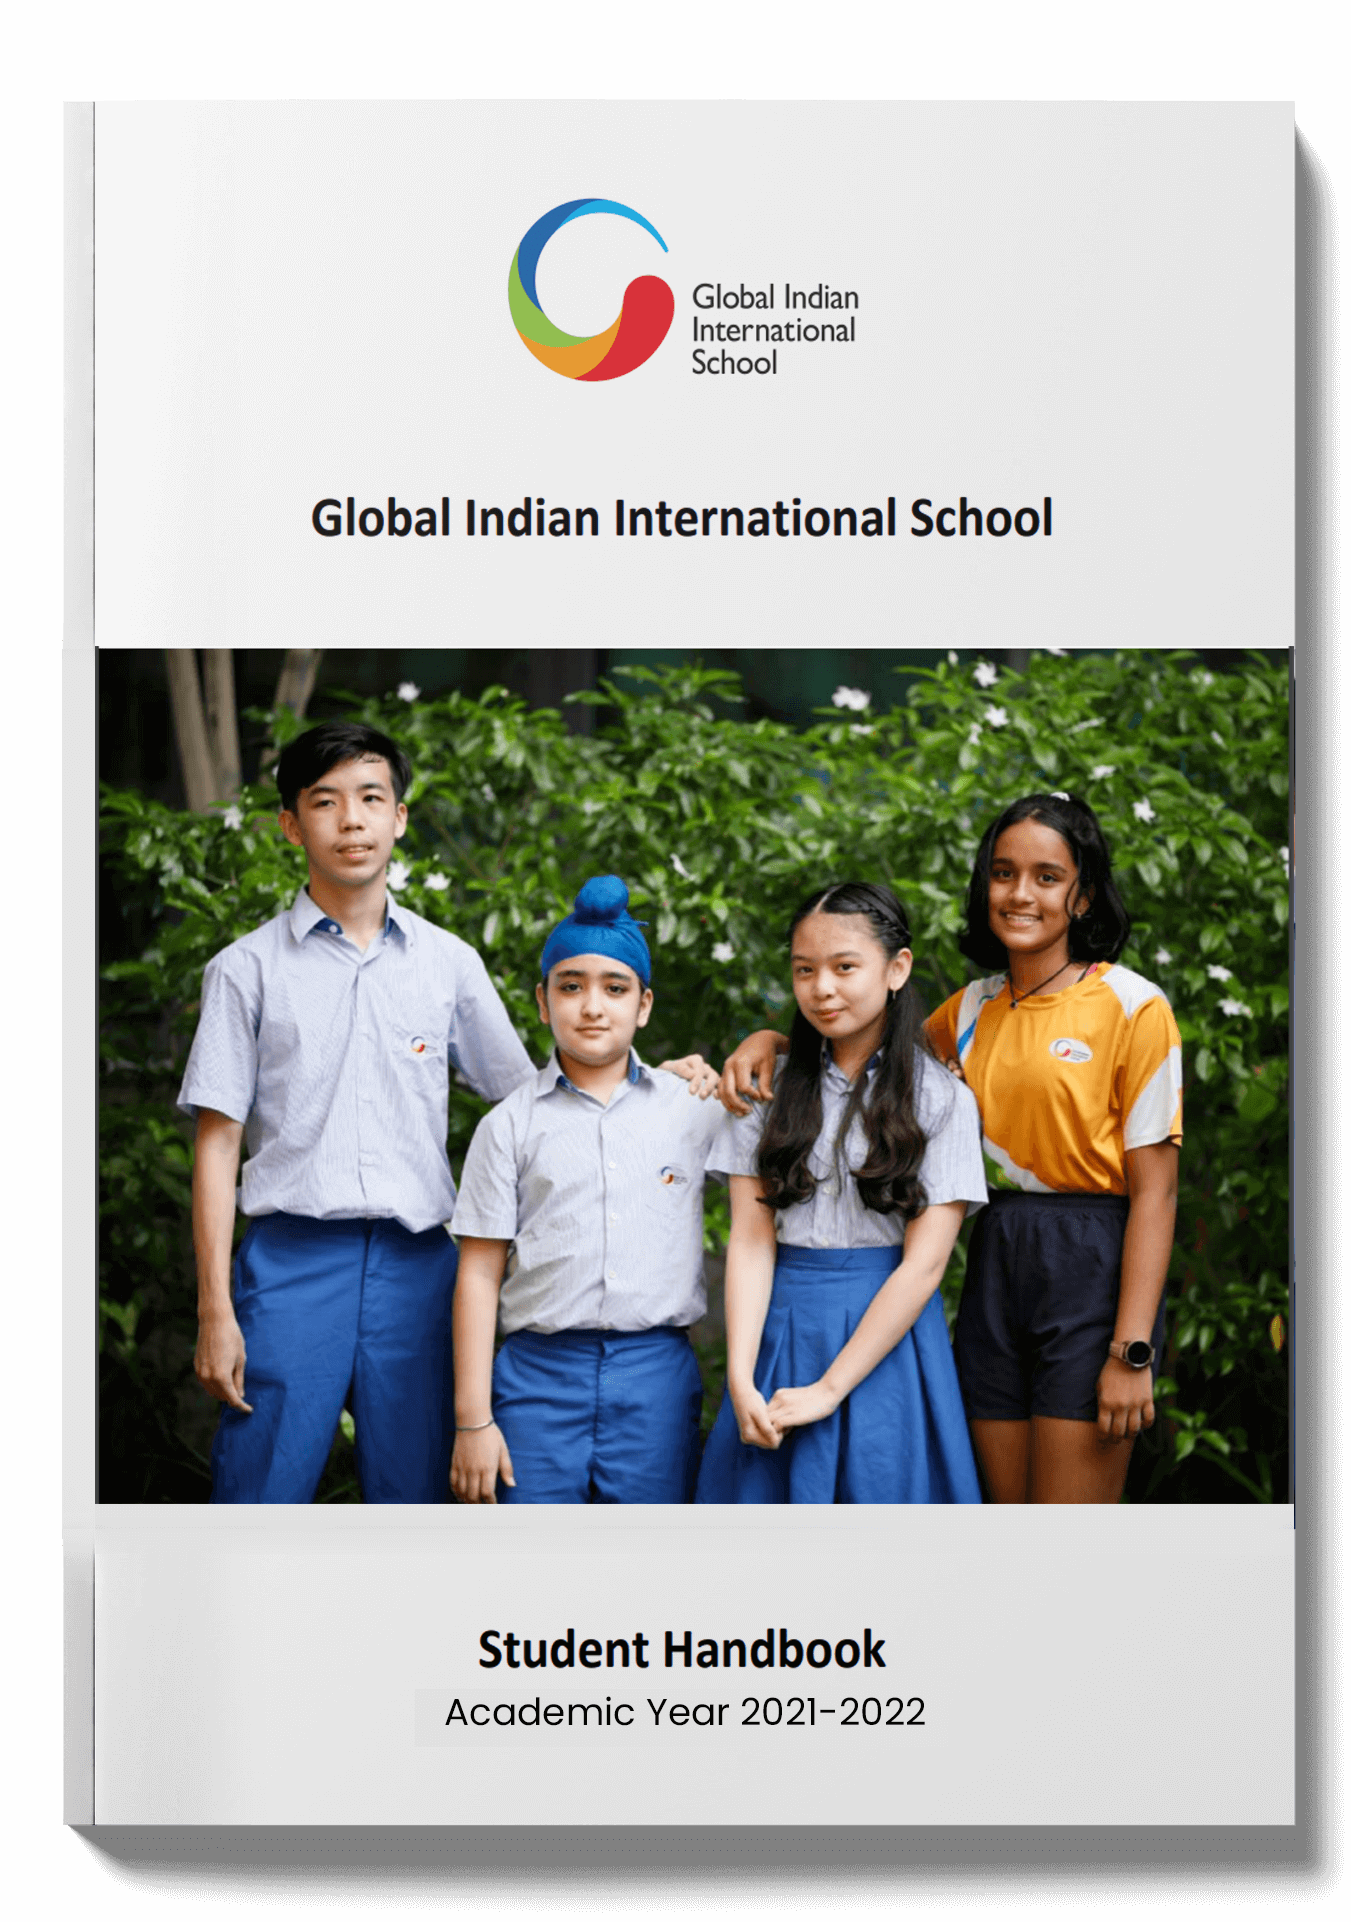 GIIS Singapore Student Handbook